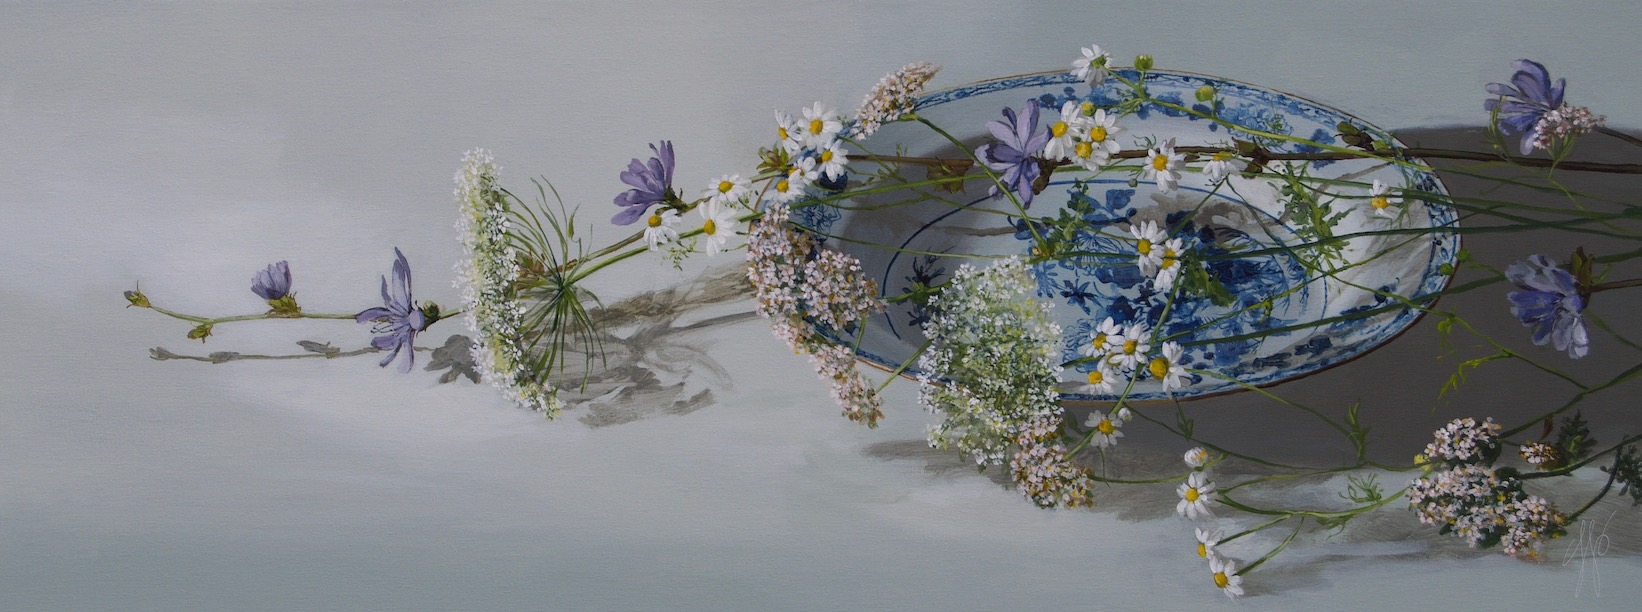 Sasja Wagenaar, Wildflowers, 2019, Acrylic on Canvas, 60 x 160 cm , €5.200, De Kunstsalon